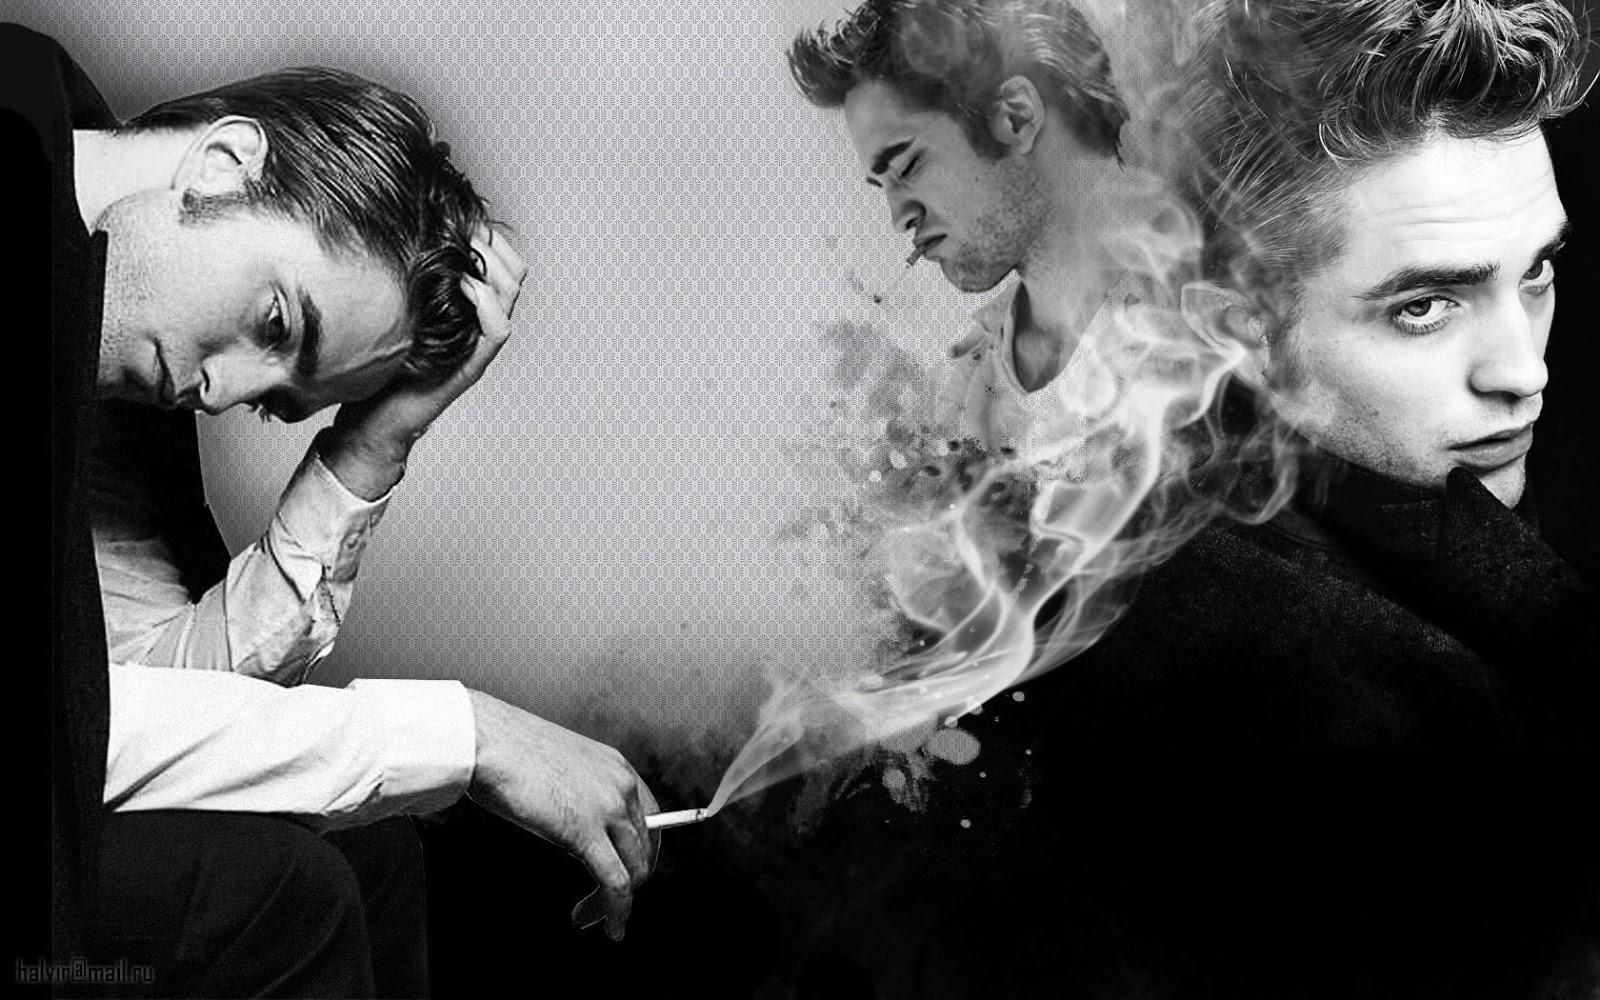 http://2.bp.blogspot.com/-XWFHgc-J01Q/UK0I38MGYKI/AAAAAAAAiQs/x-cdcva6ed0/s1600/robert-pattinson-smoking.jpg